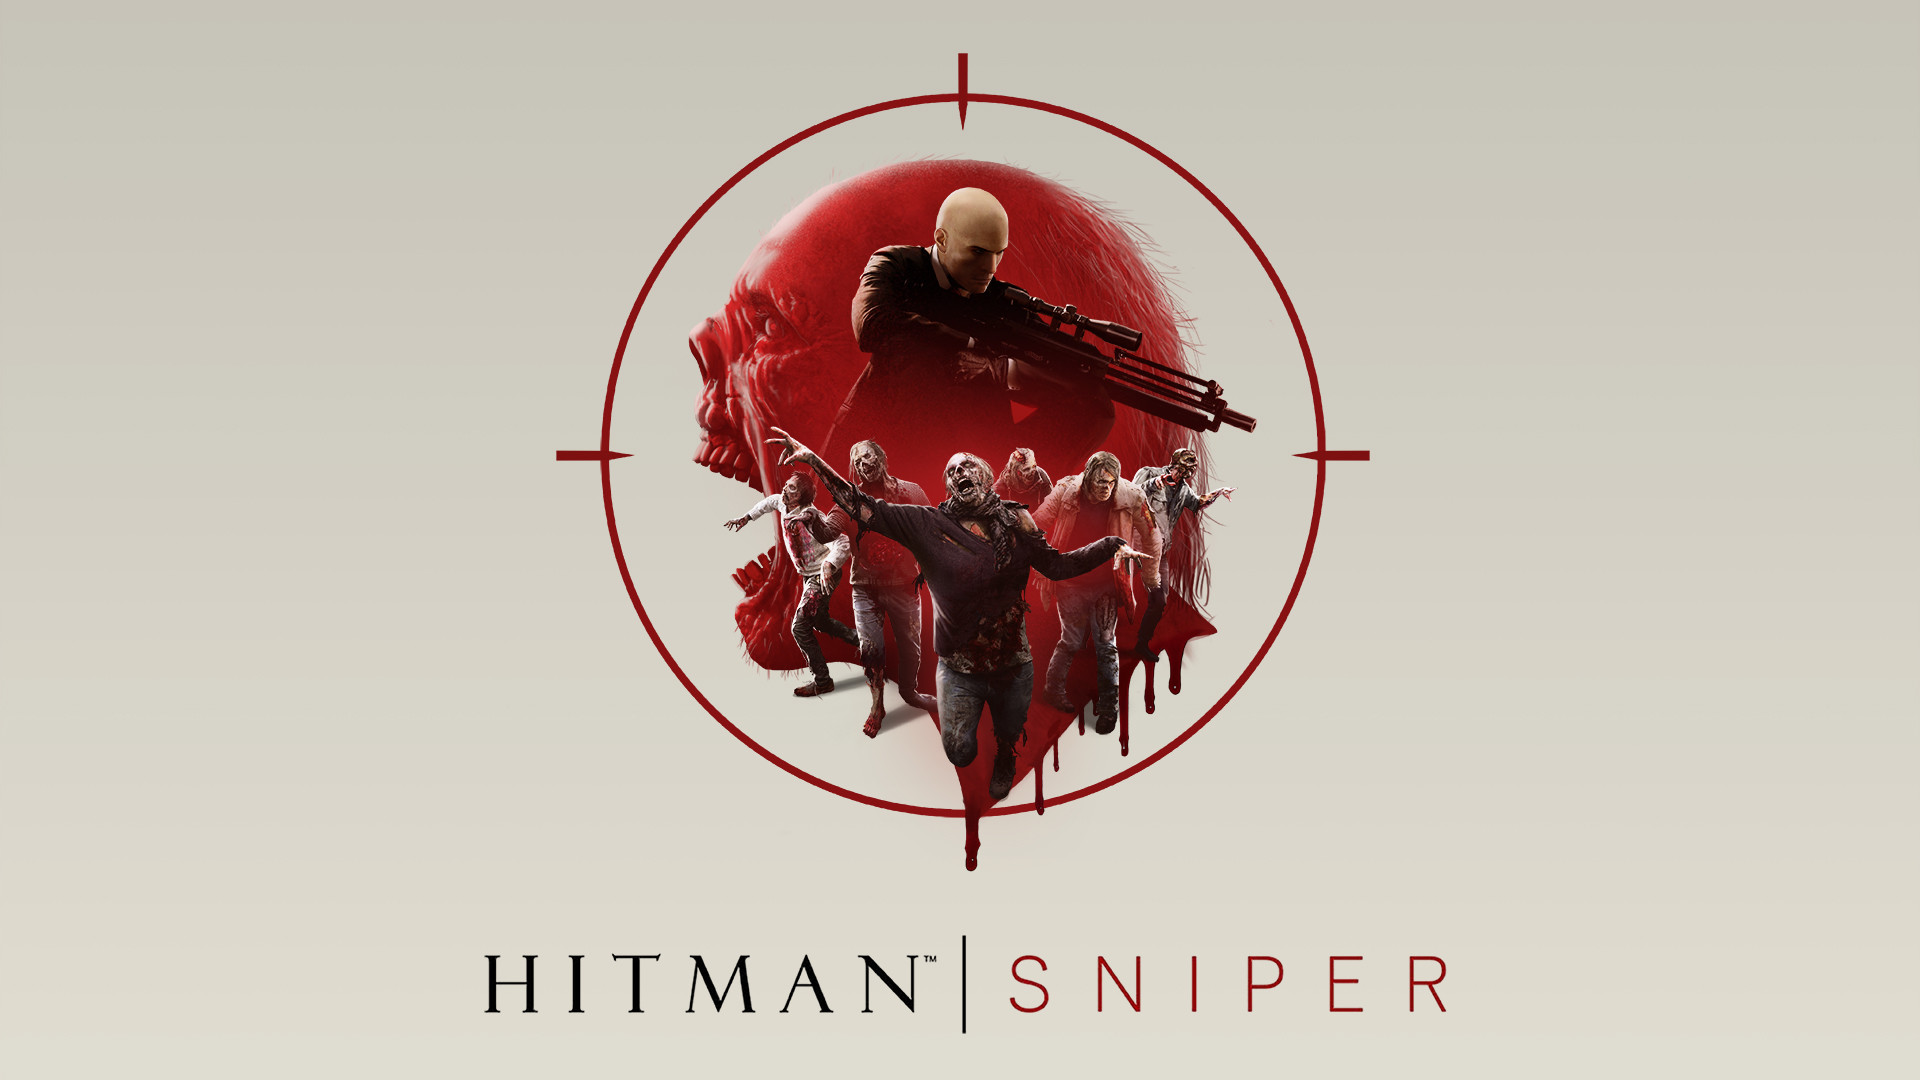 Hitman: Sniper Wallpaper